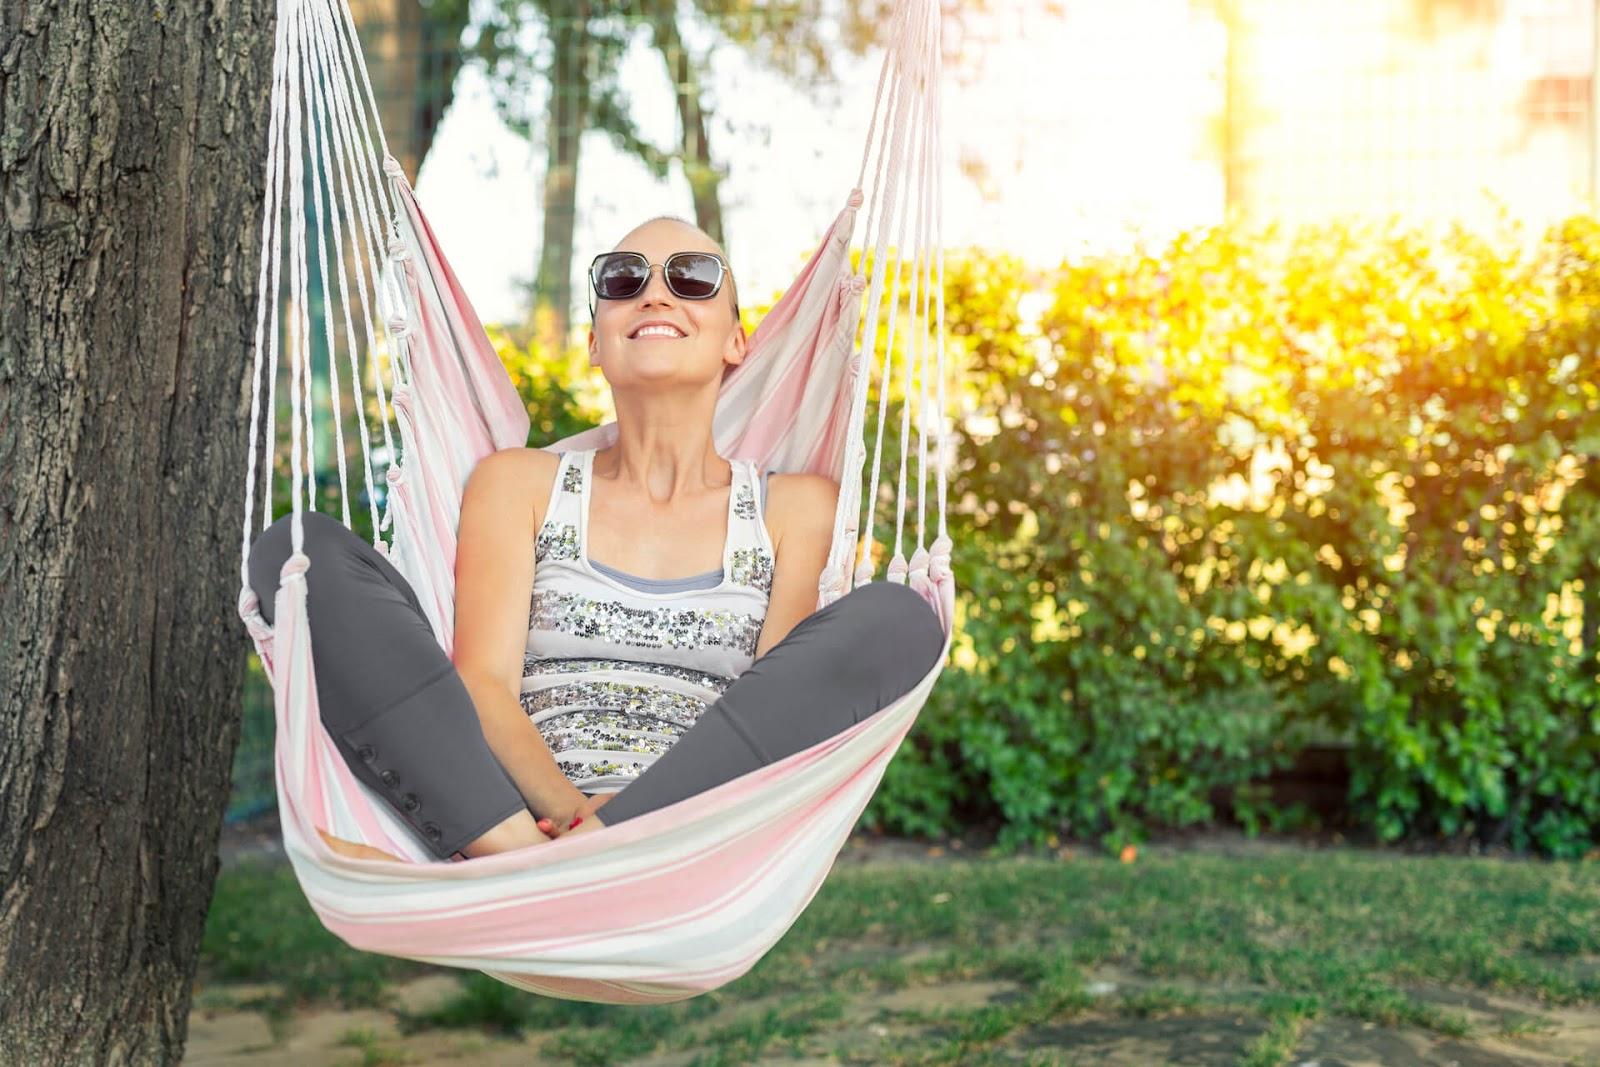 Bald woman smiling in hammock chair